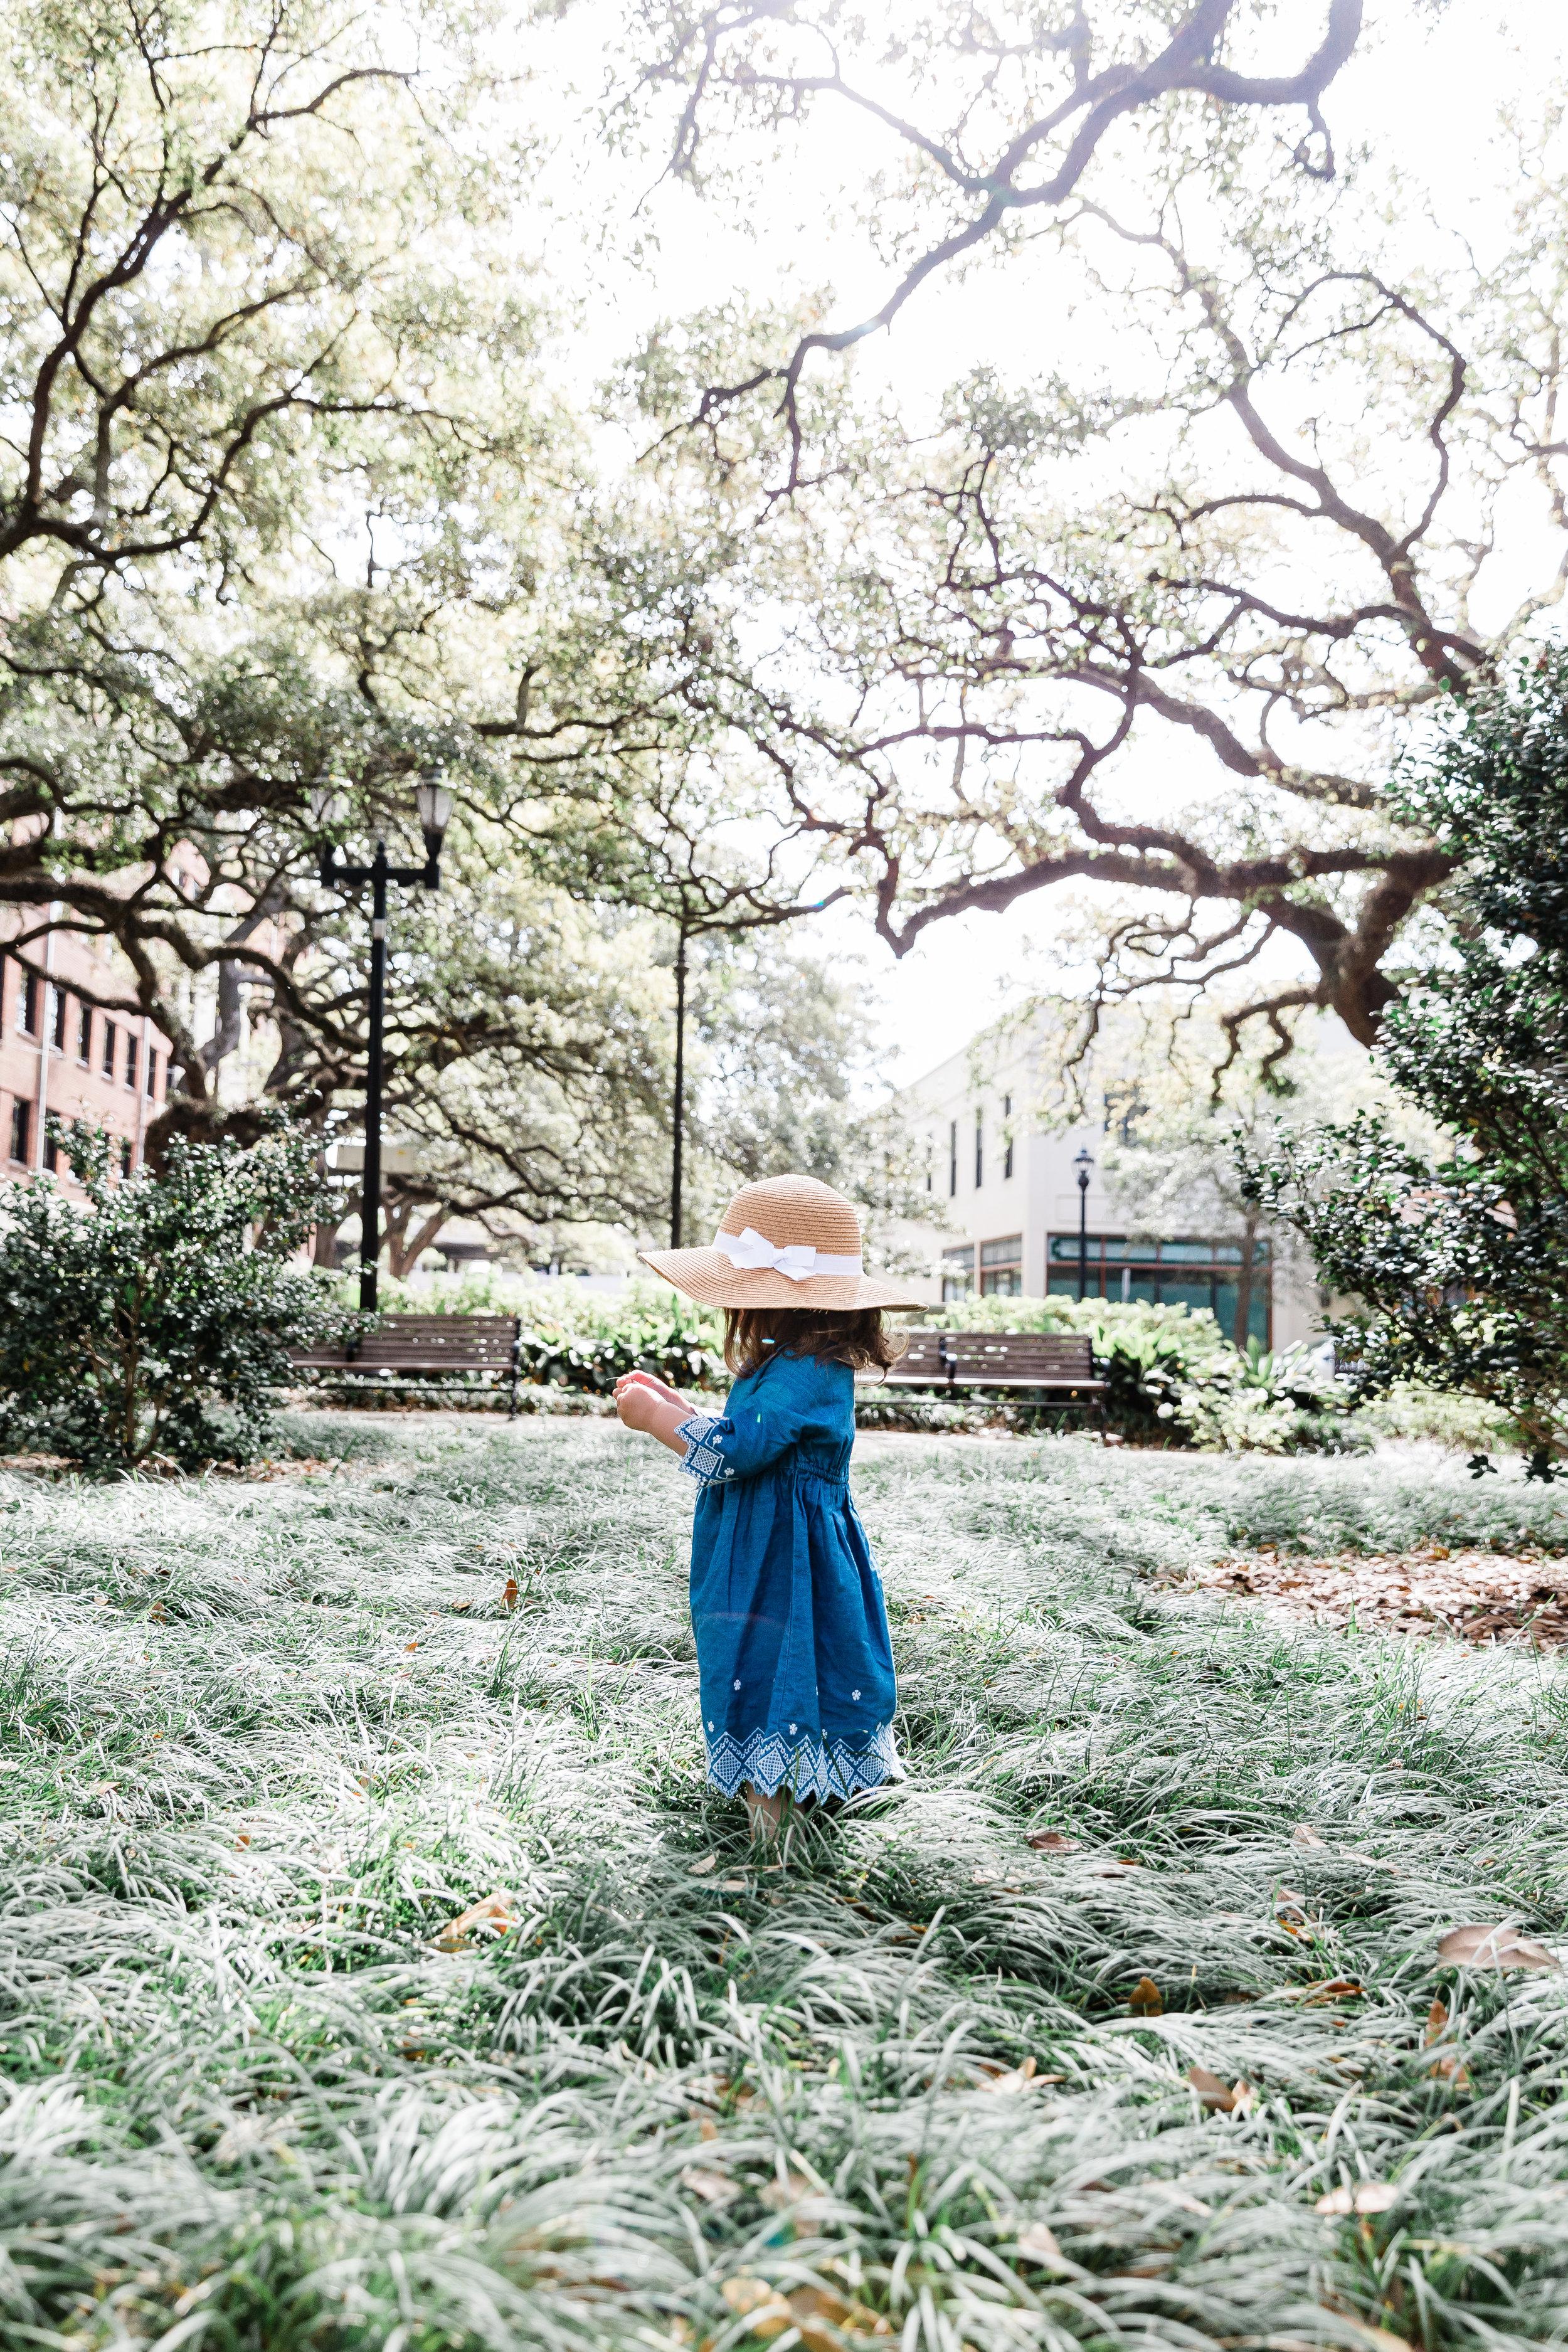 20190331-Georgia-reynolds square-Meghan Gardner-Southern Lens Photography-Savannah Photographer-downtown savannah27.jpg